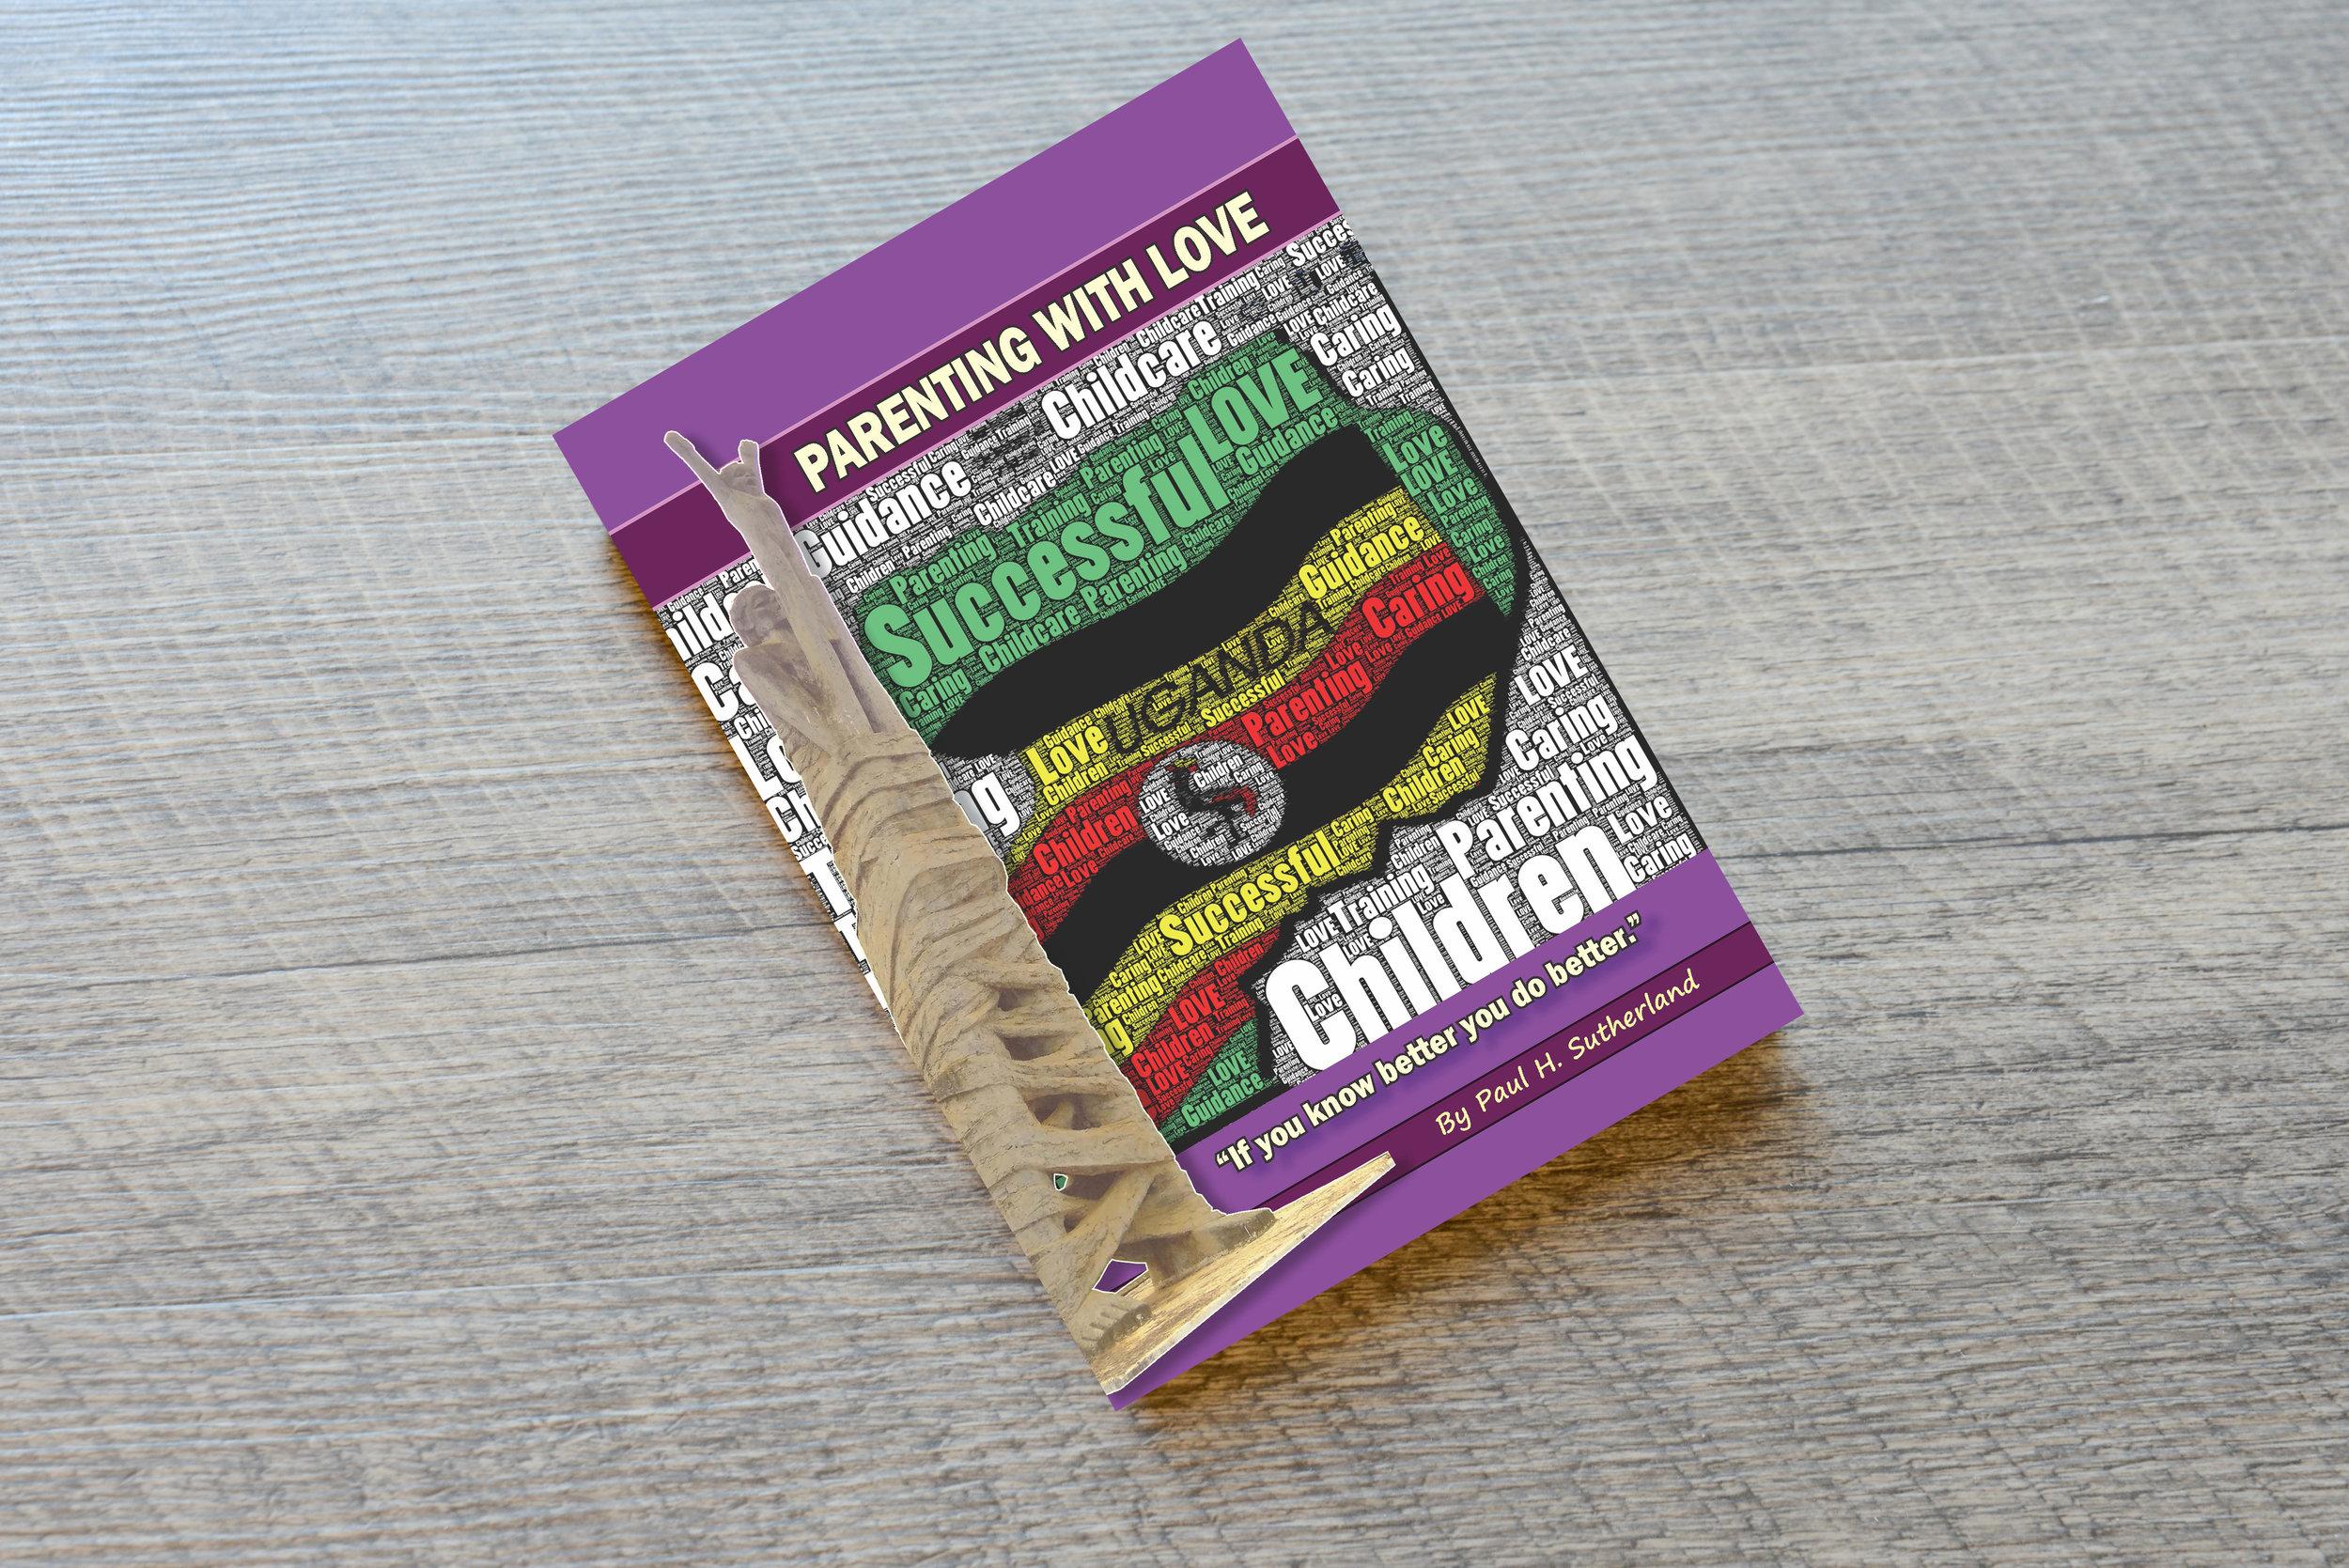 PaulsBooks-4631 parenting with love.jpg